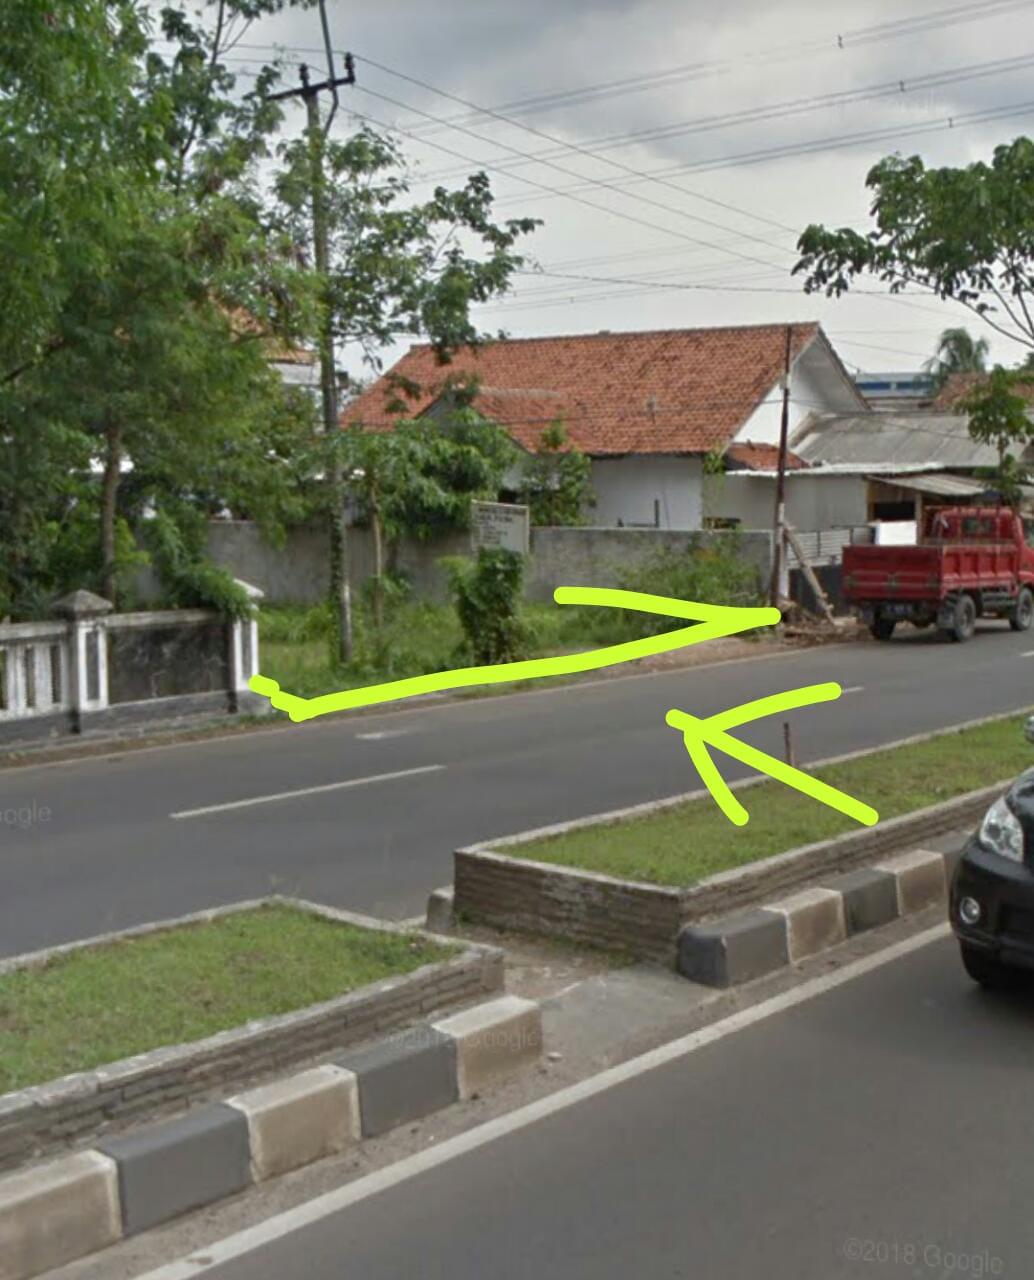 Jual Tanah di Jl.Raya Serang-Pandeglang Tengah Kota Sertifikat SHM